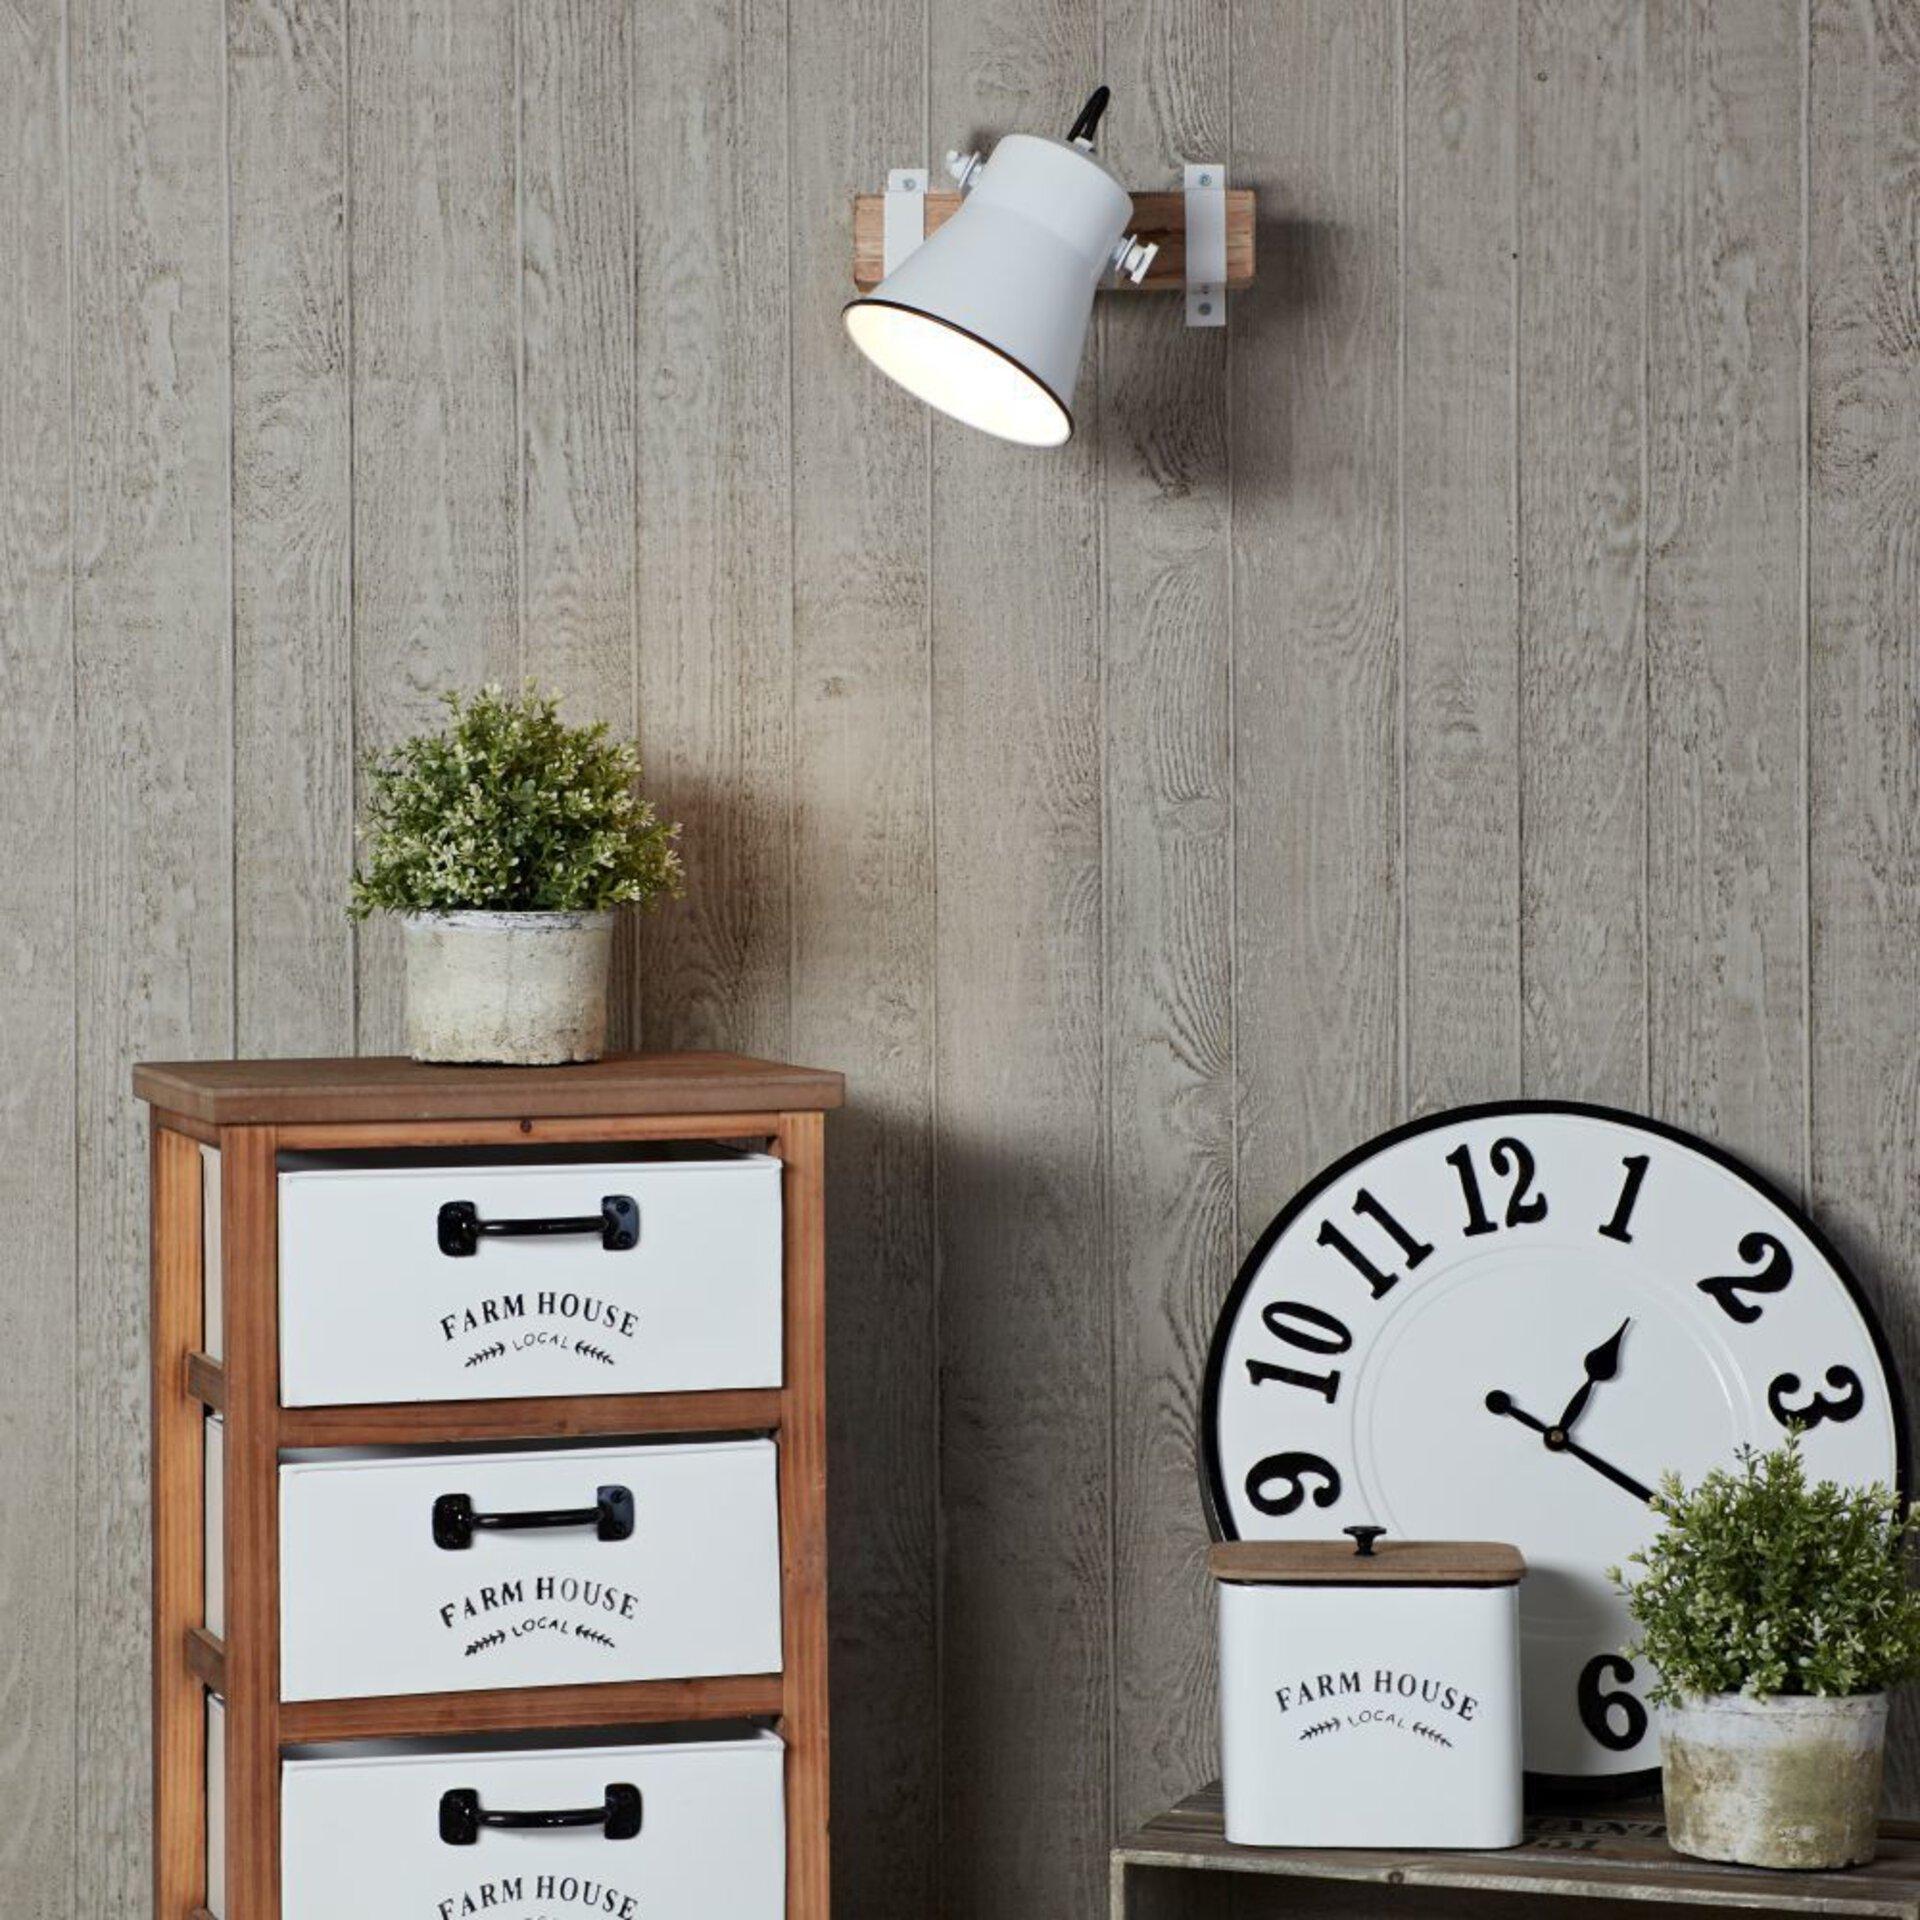 Wandleuchte PLOW Brilliant Holz weiß 17 x 22 x 24 cm